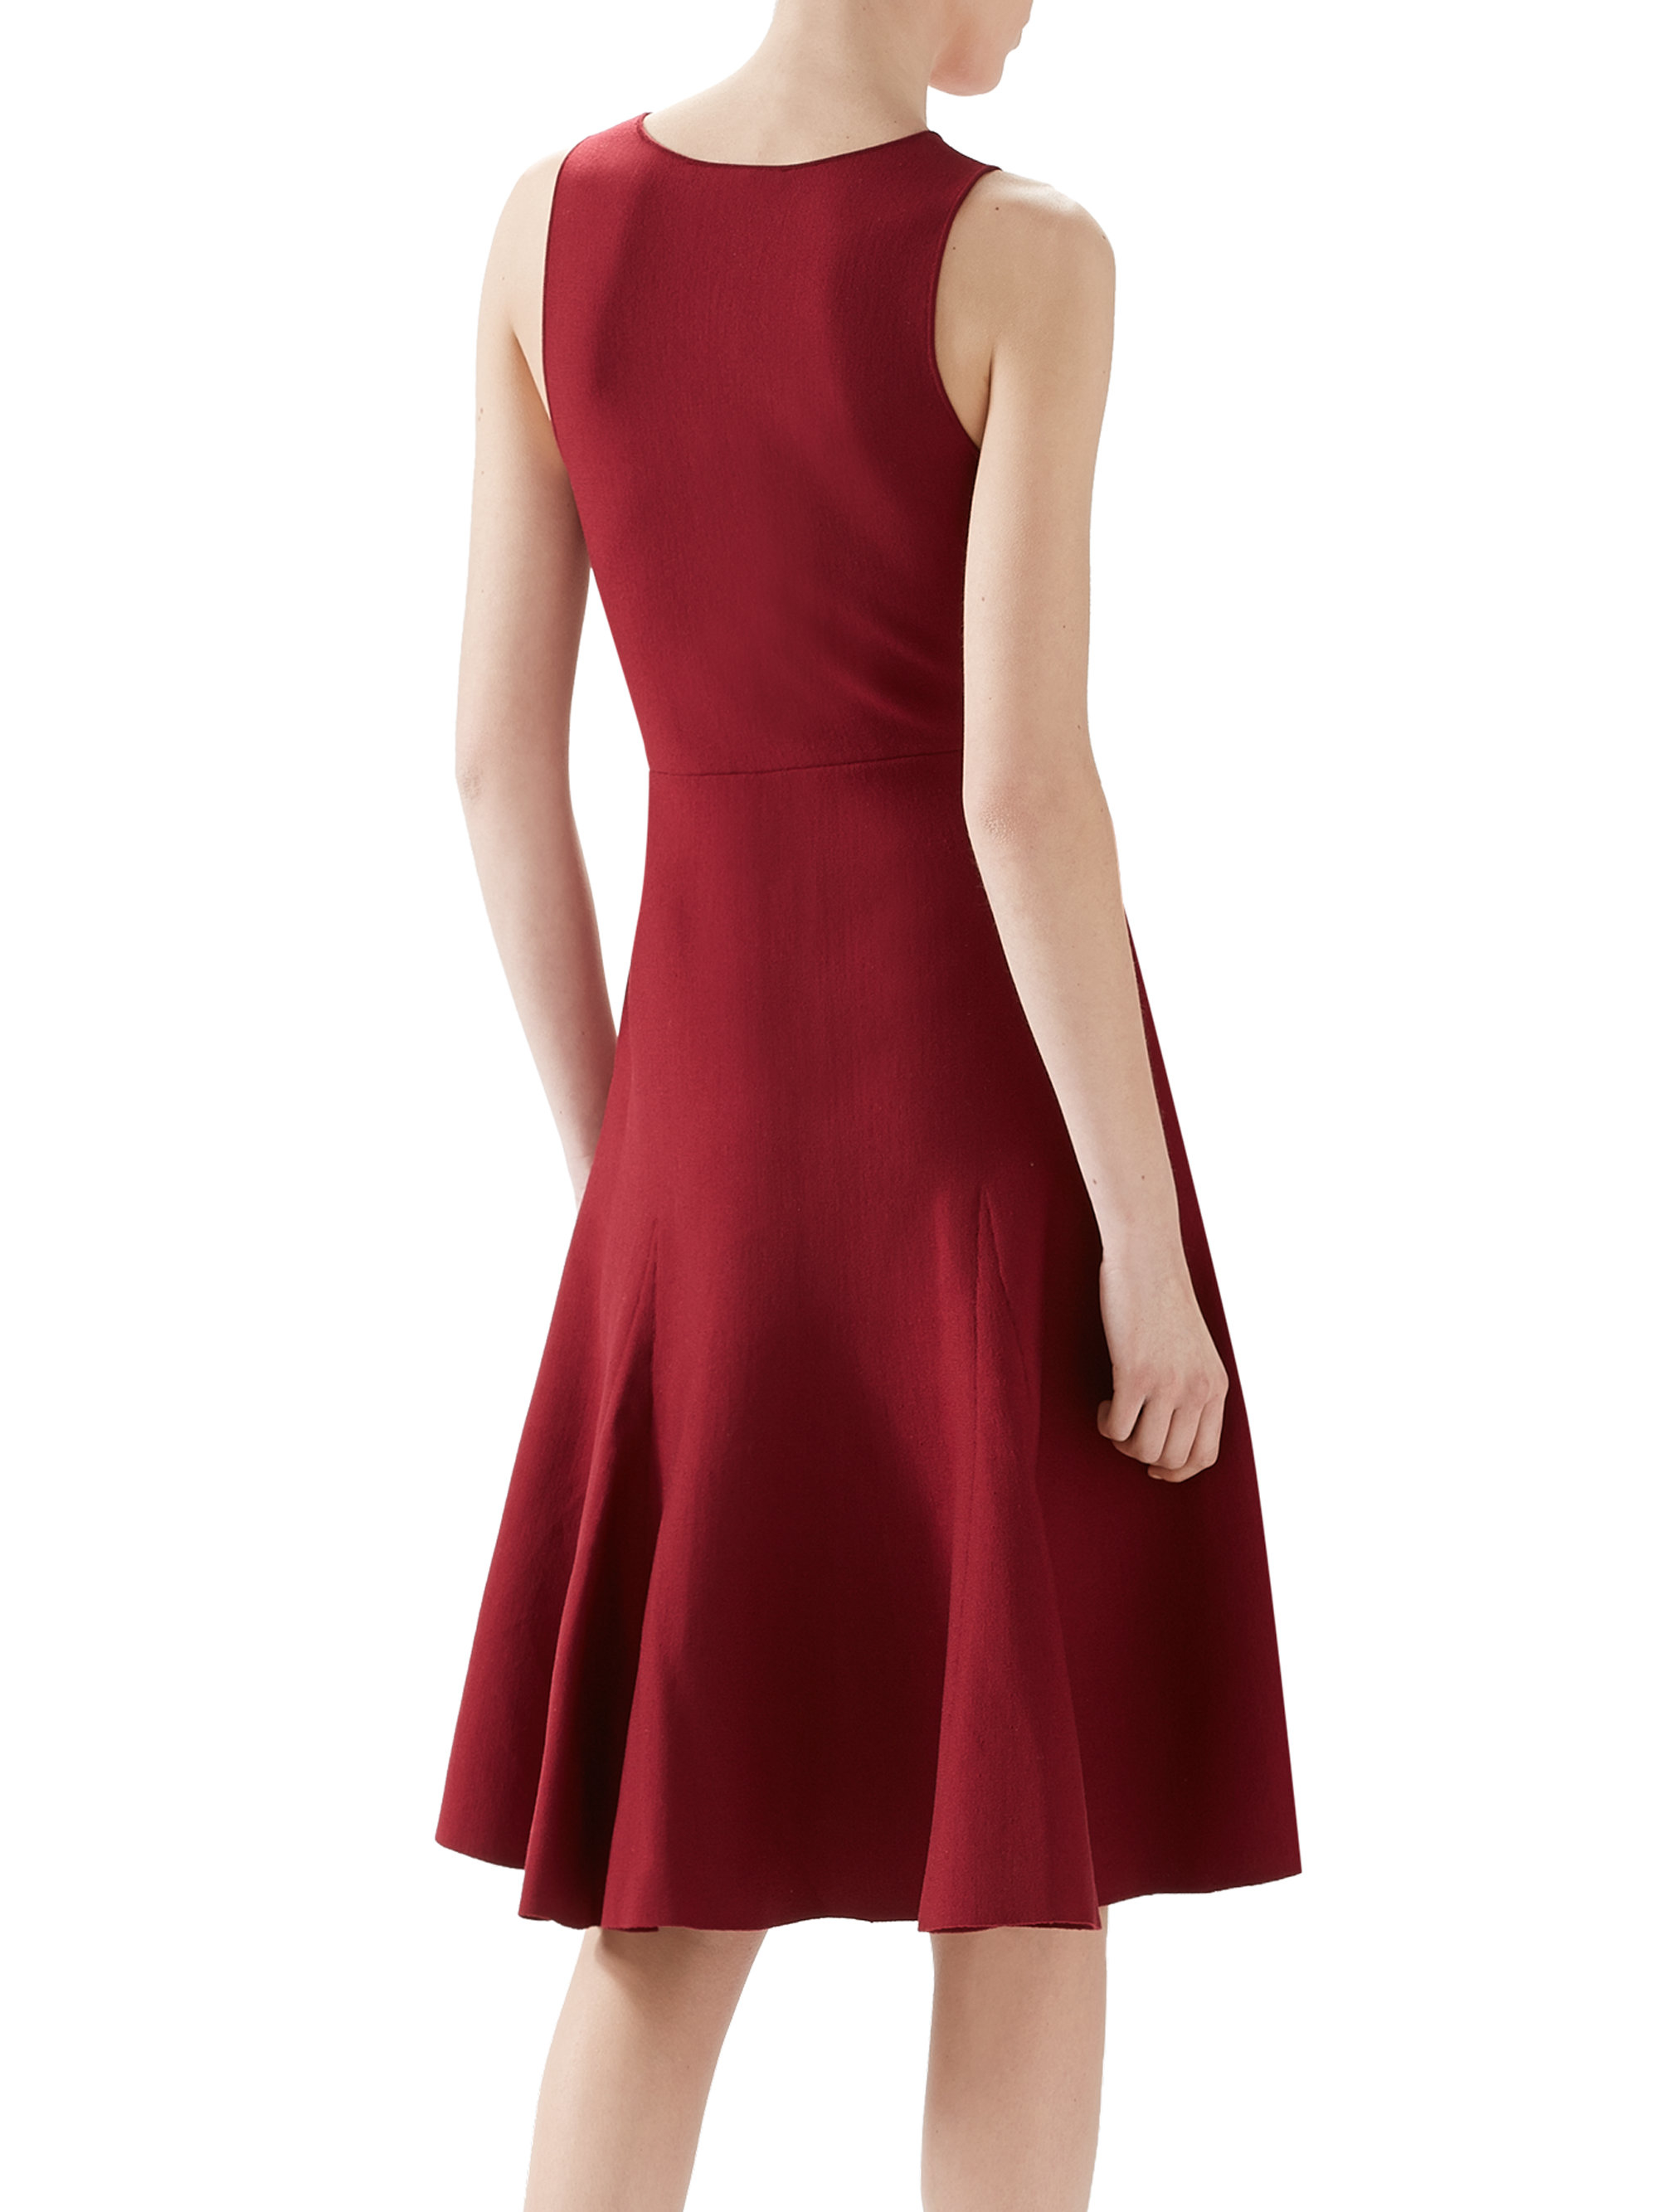 Lyst - Gucci Knit Godet Dress in Purple